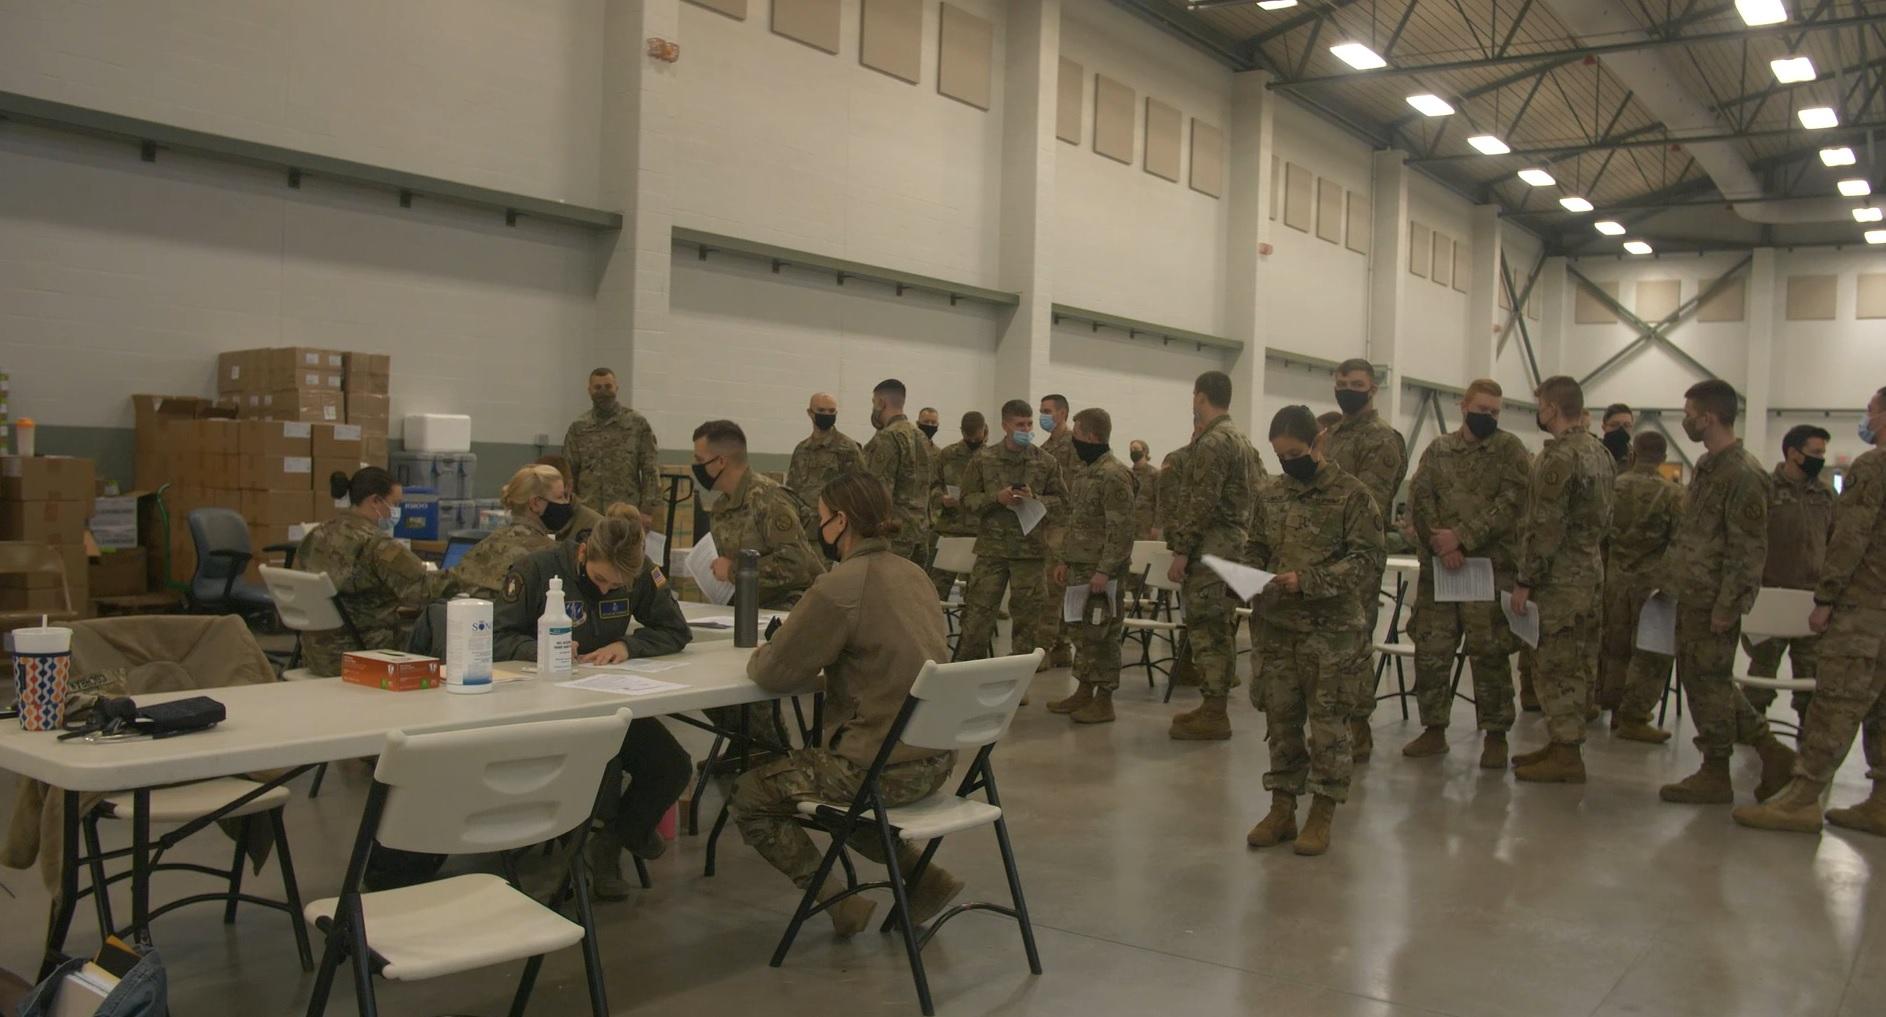 Wv National Guard Troops Deploy To Washington D C Wboy Com